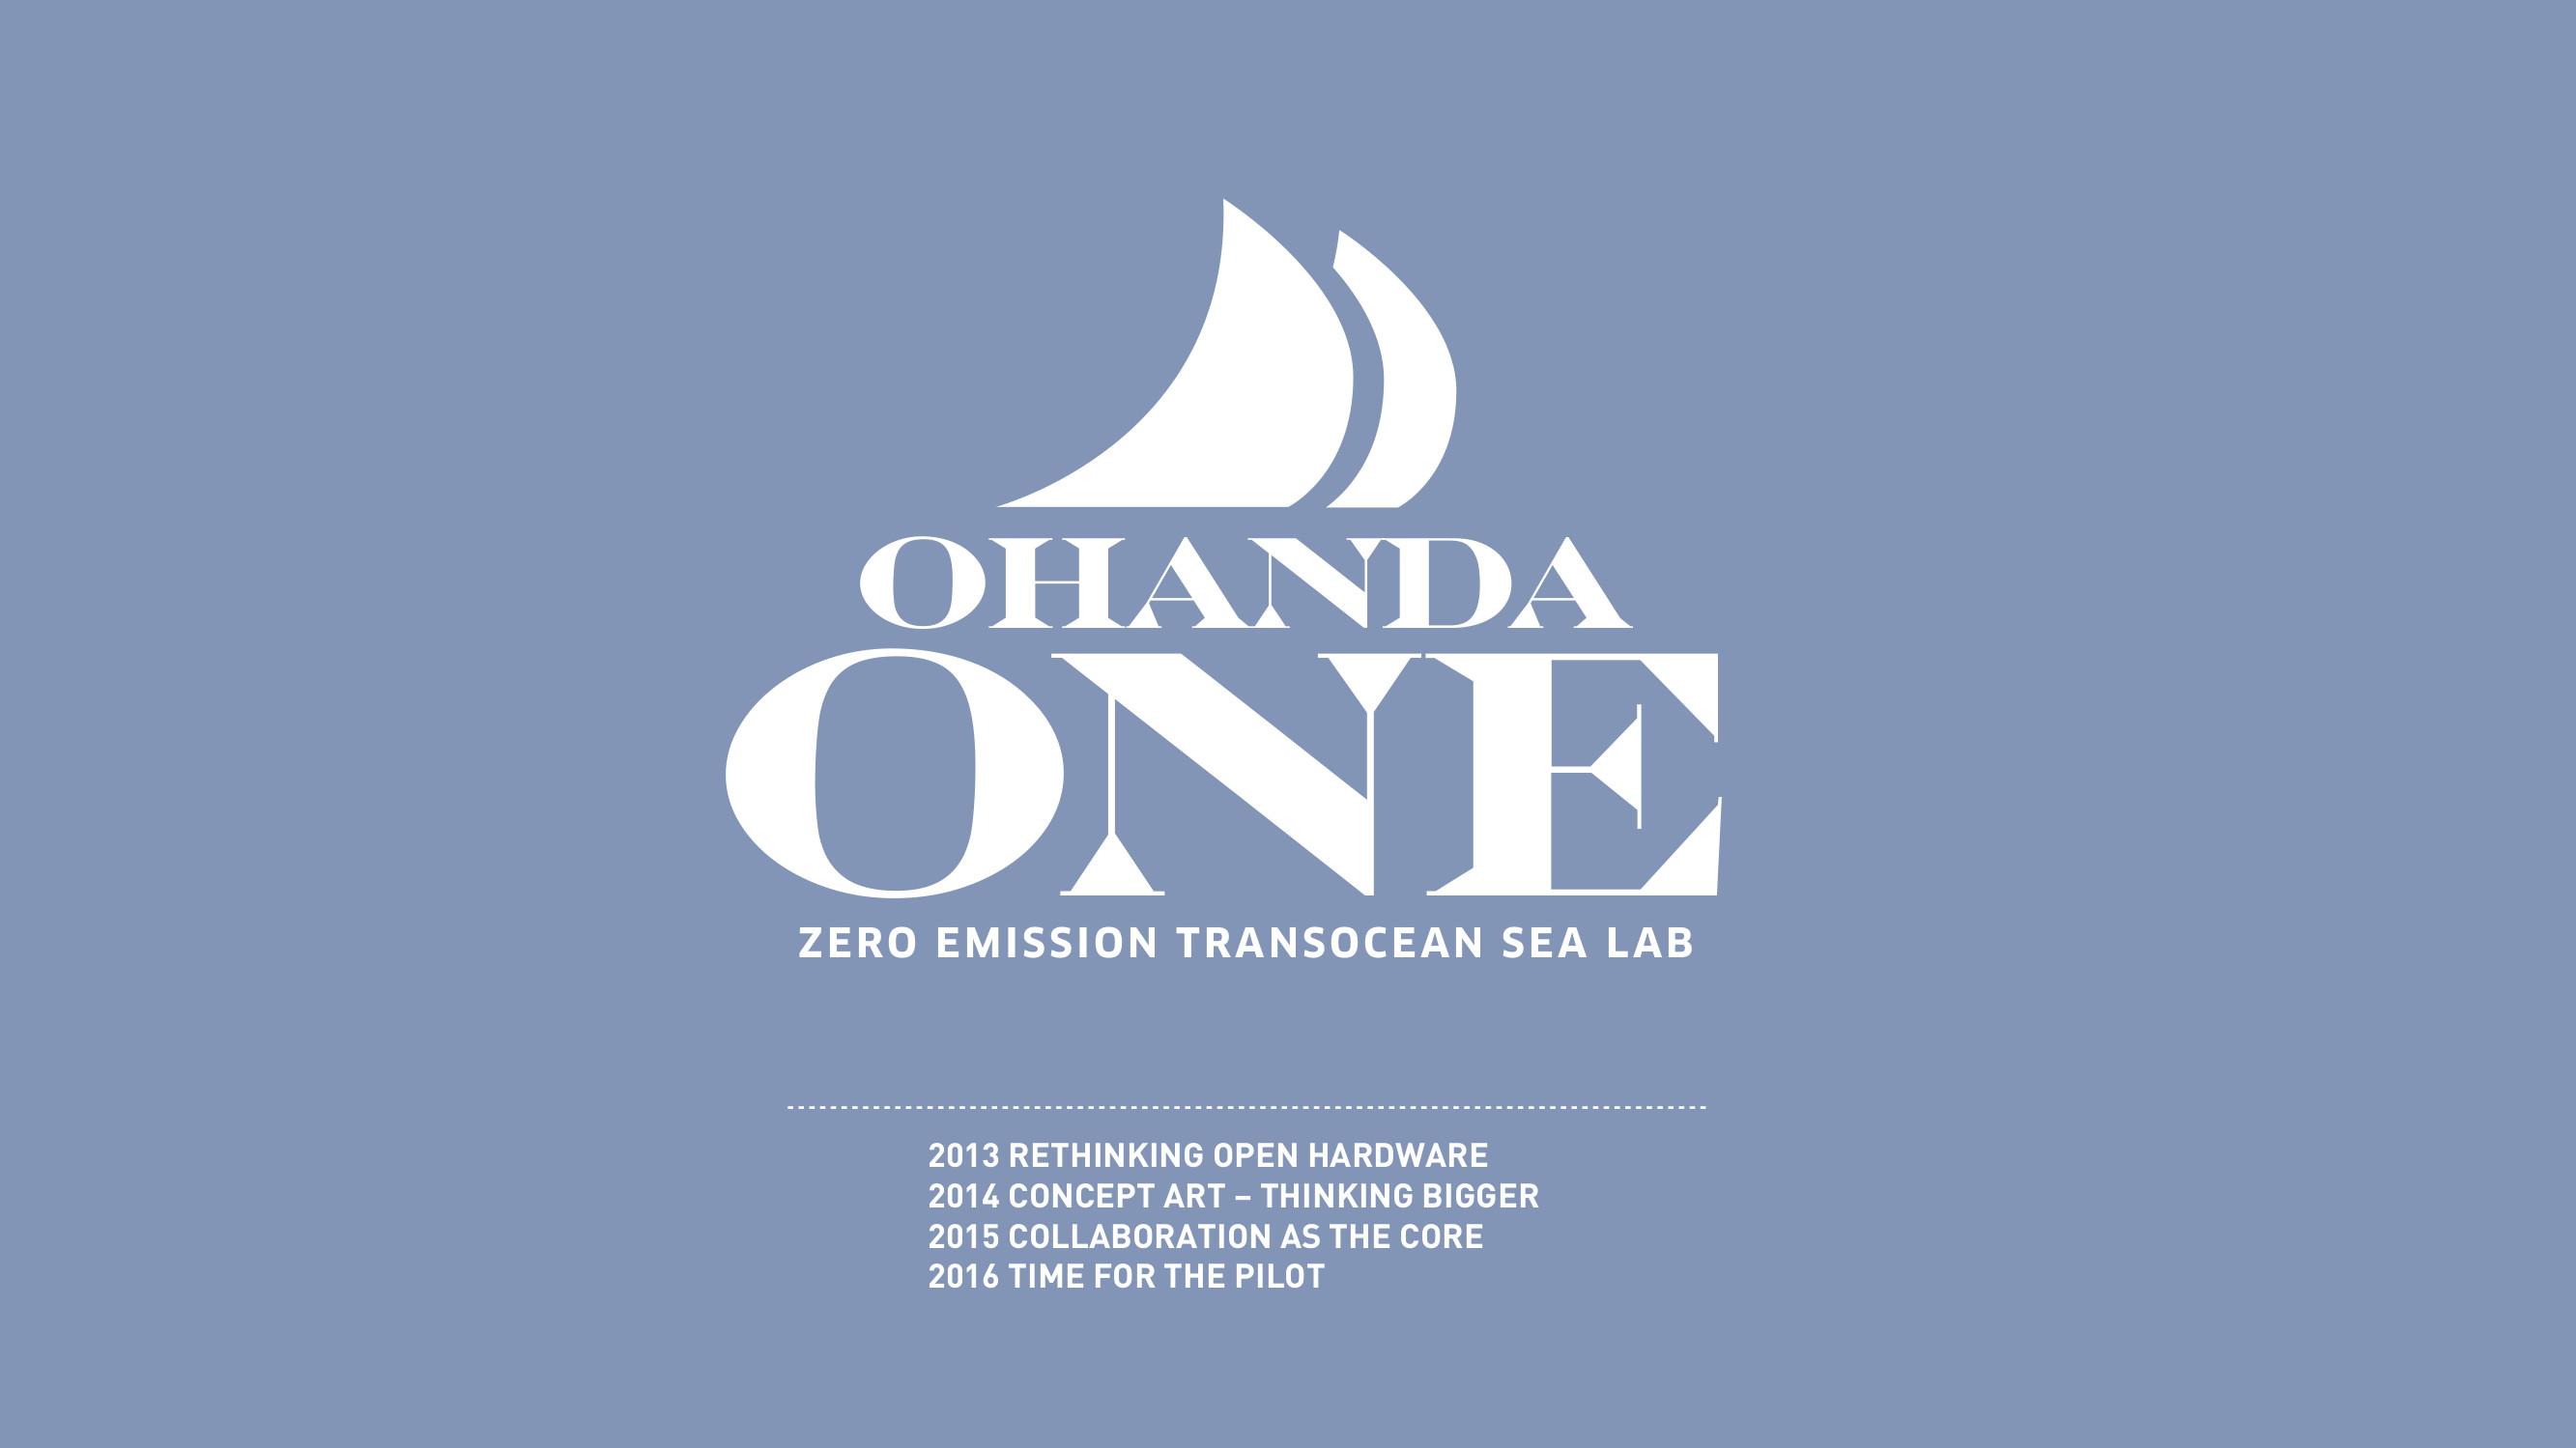 Ohanda One